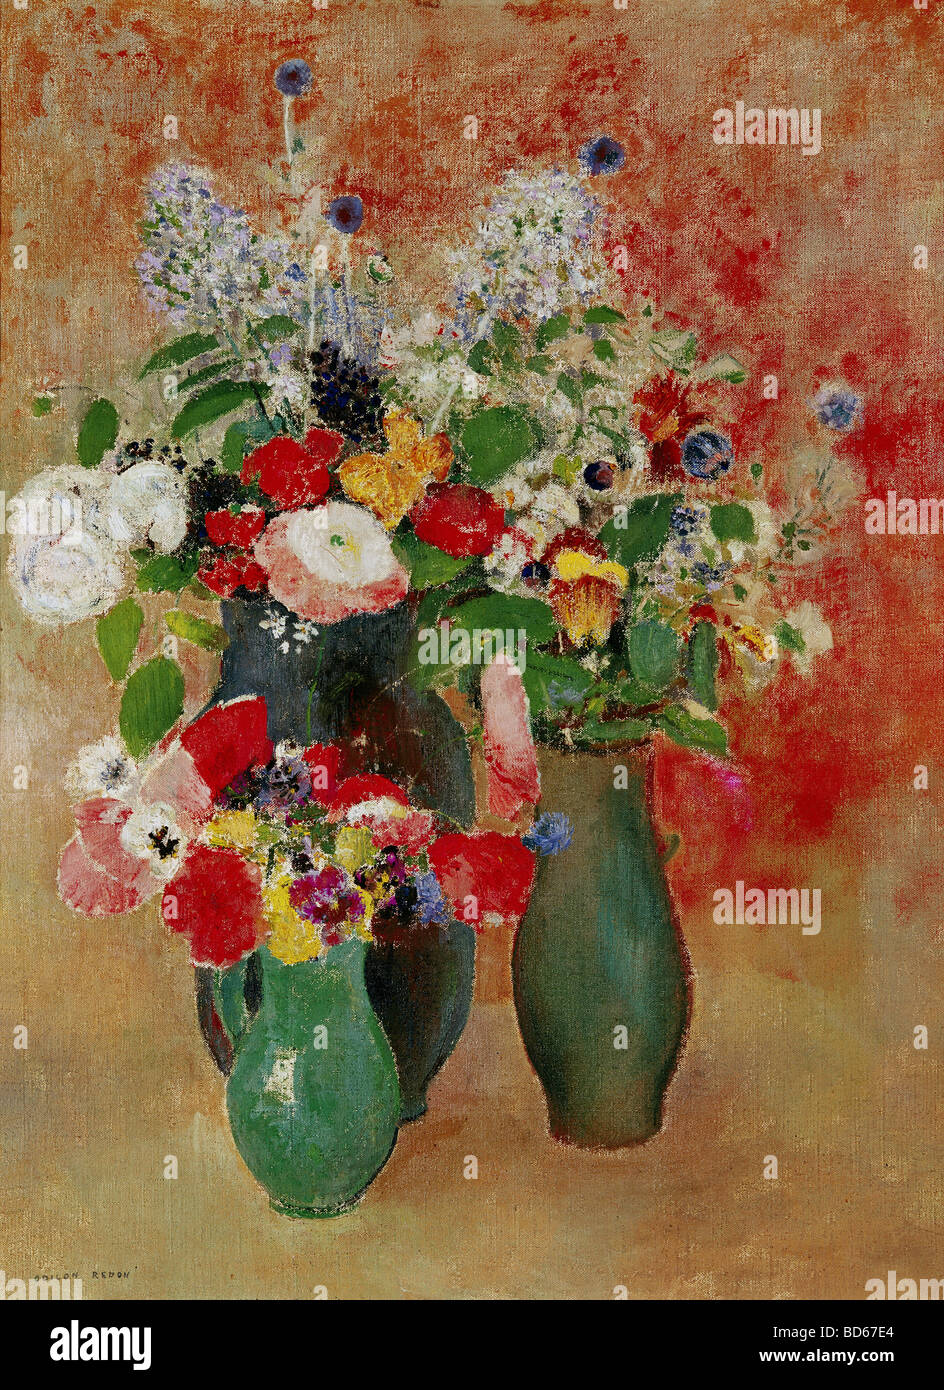 Bellas artes, Redon, Odilon, (22.4.1840 - 6.7.1916), pintura, 'flores bodegón', Von der Heydt-Museum de Wuppertal, Foto de stock